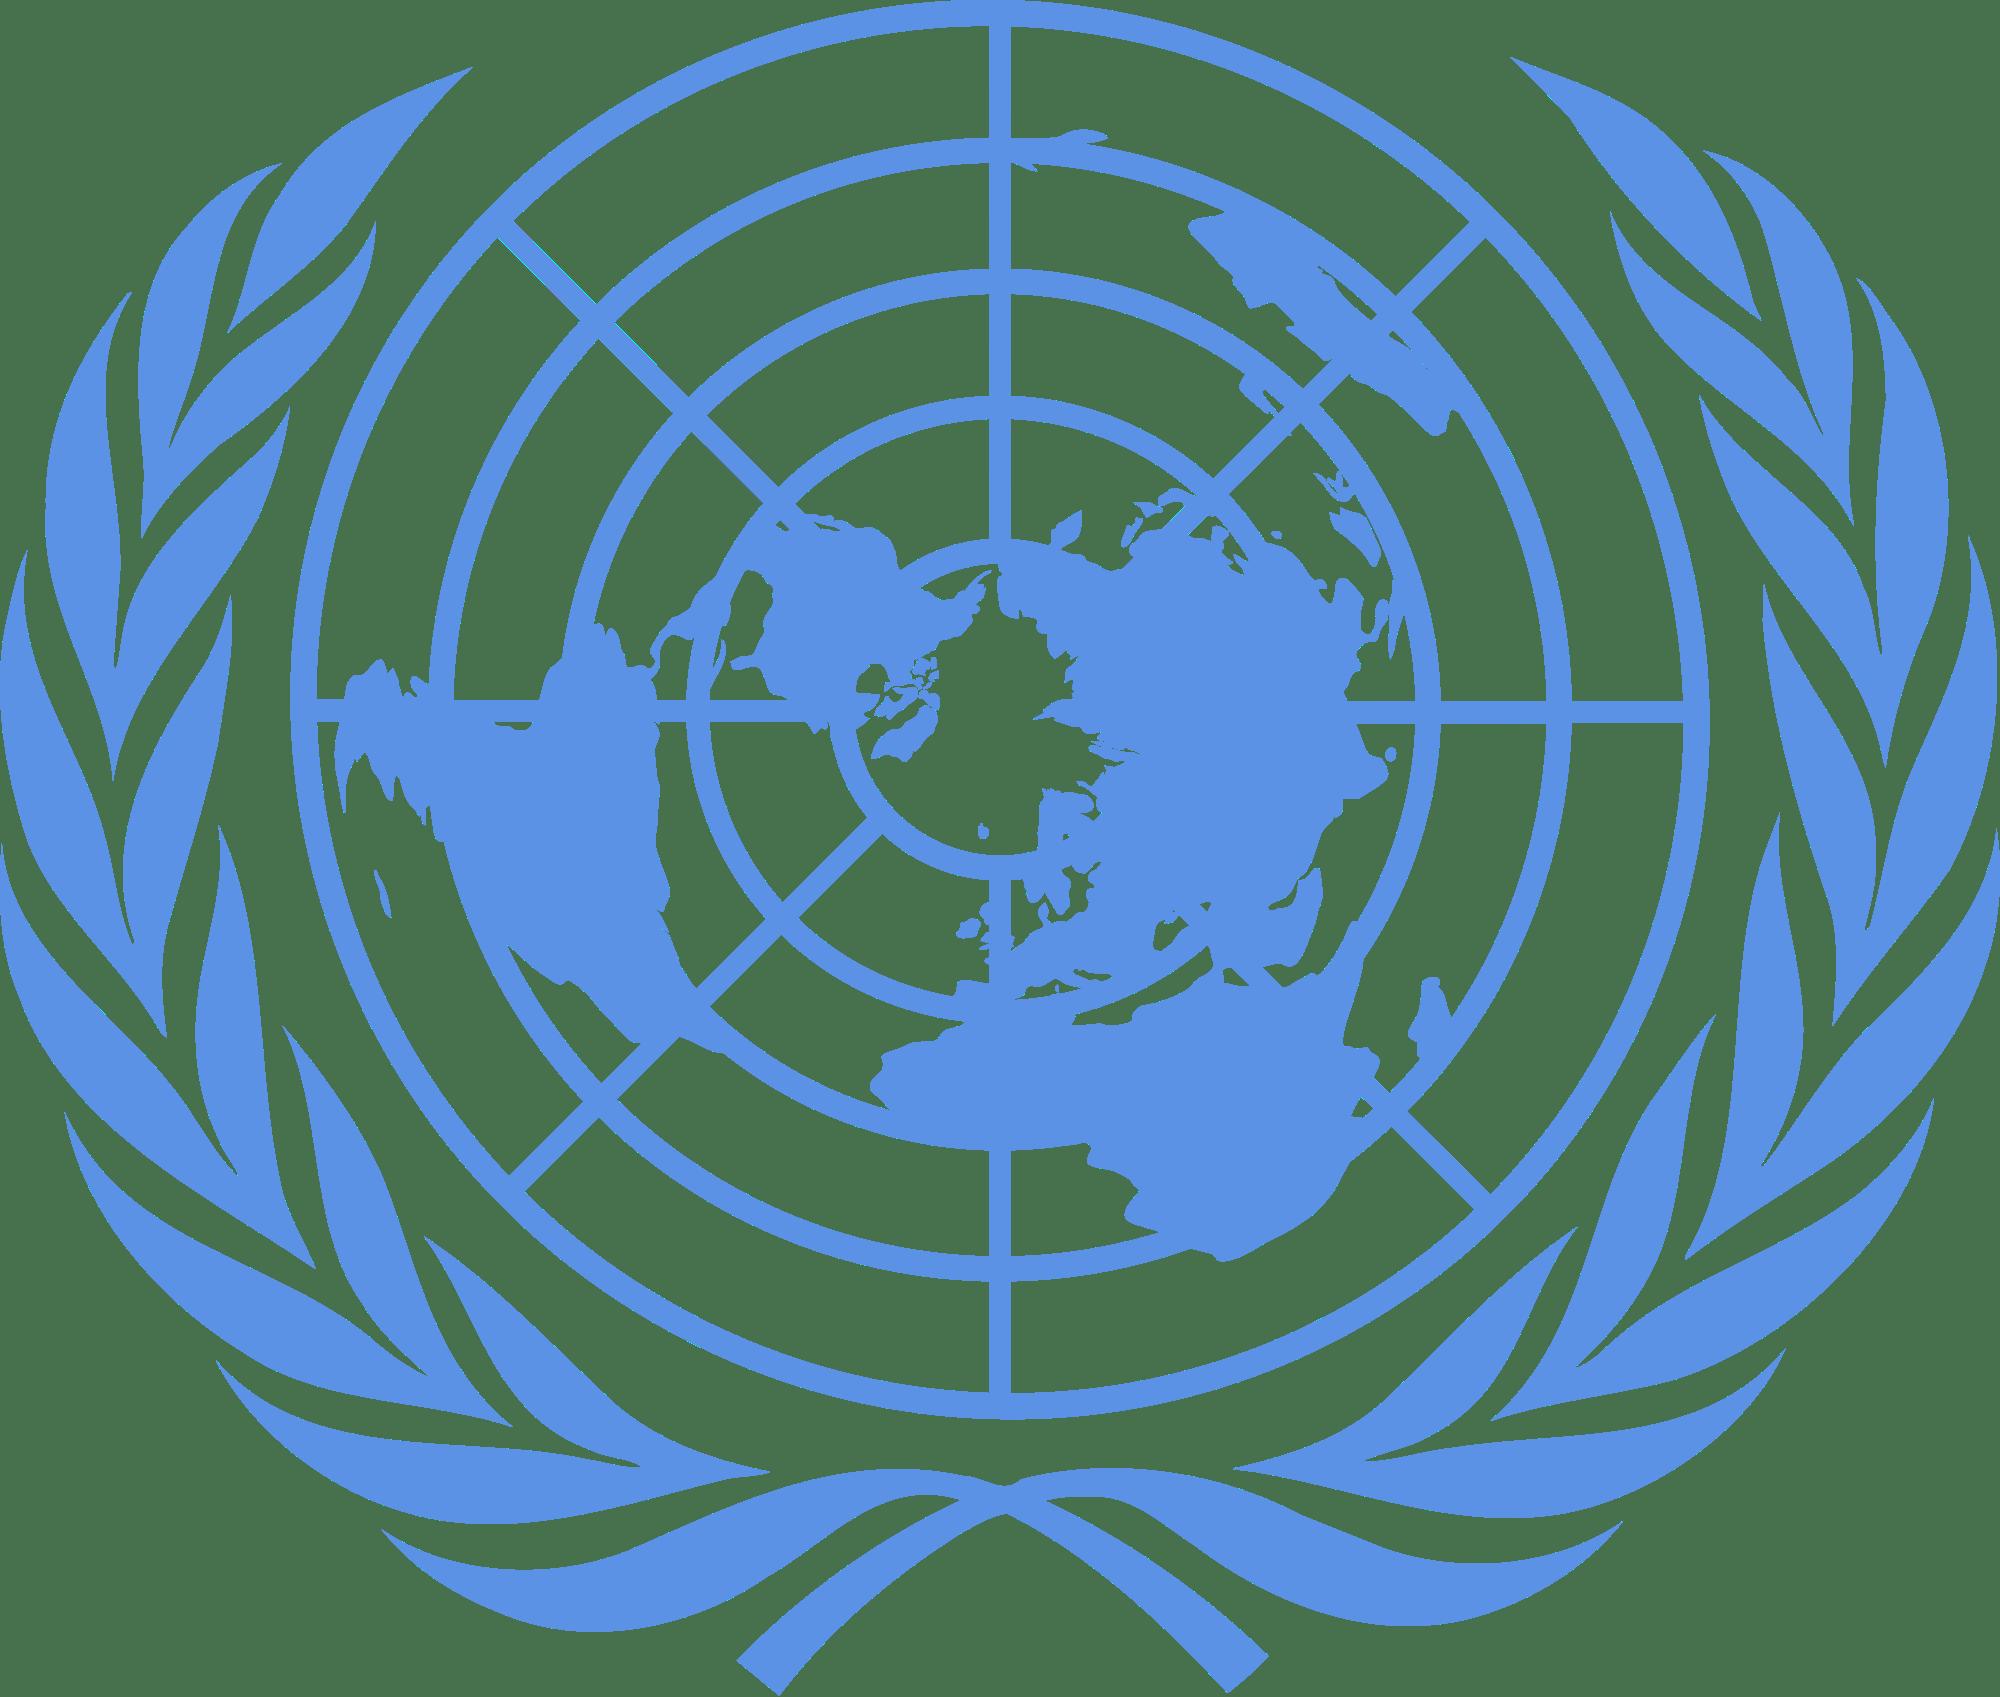 United Nations Emblem transparent PNG.